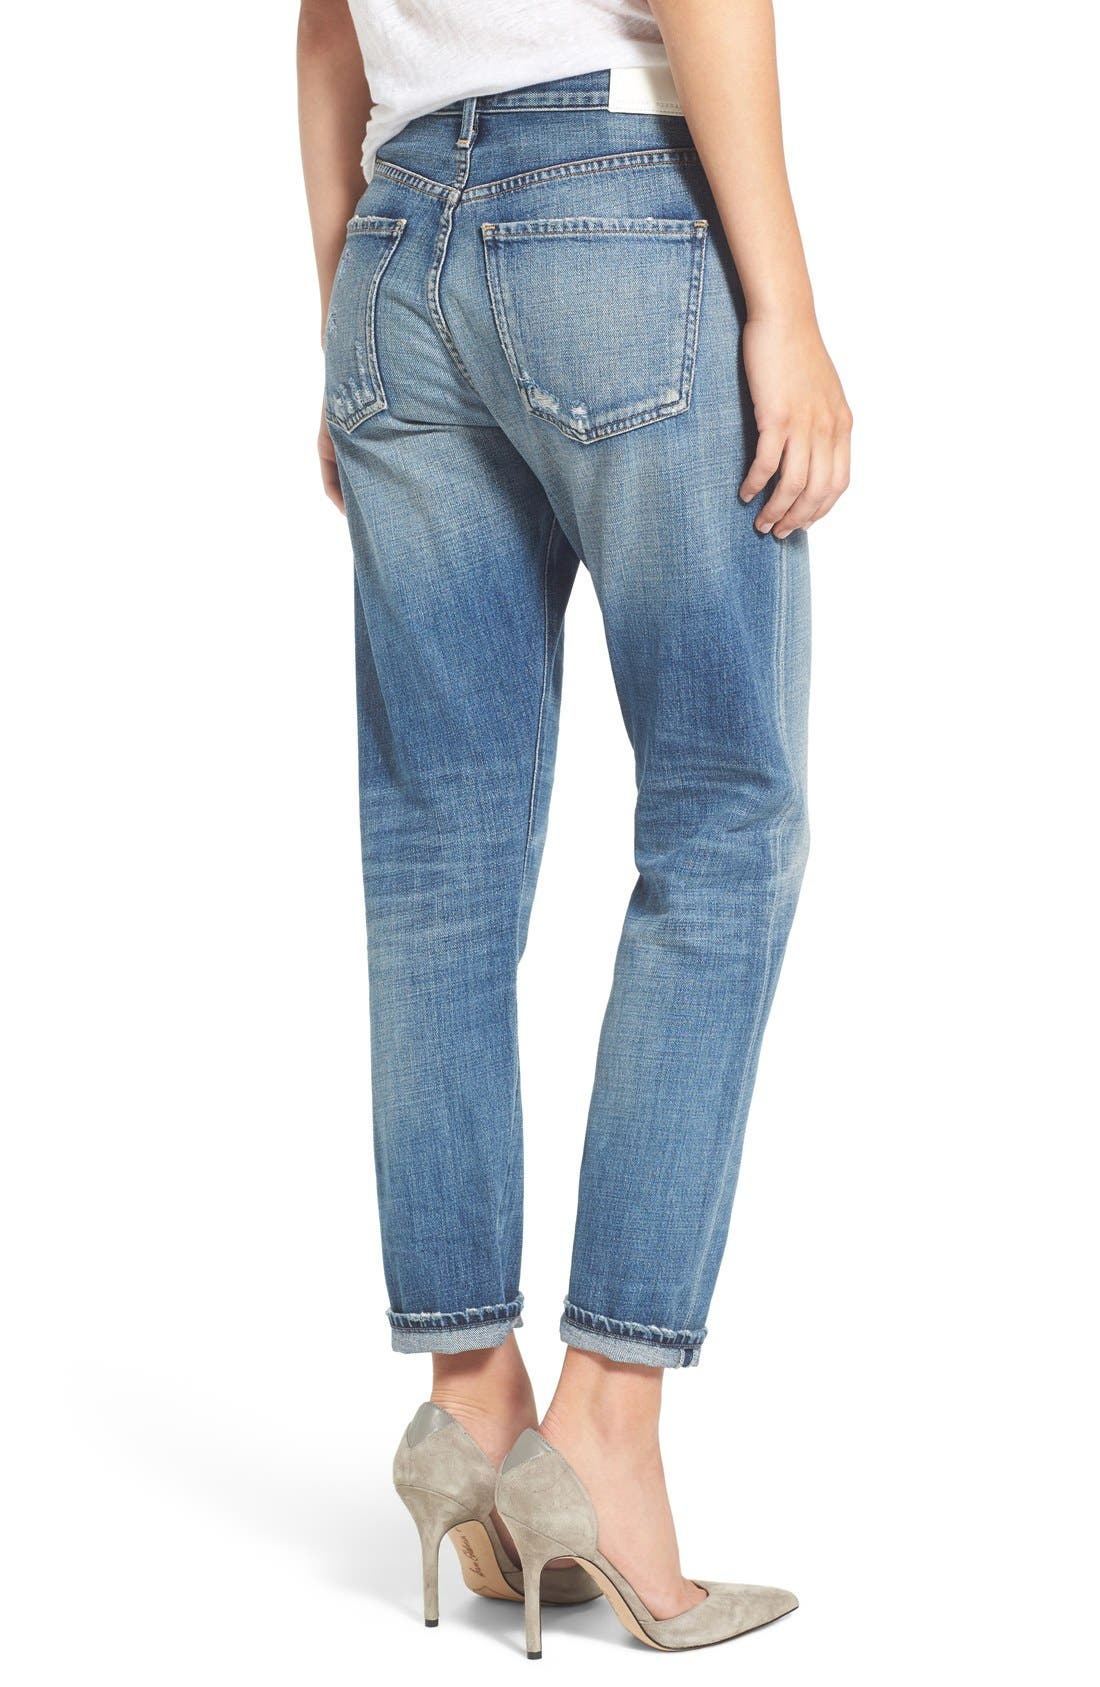 Liya High Waist Slim Boyfriend Jeans,                             Alternate thumbnail 2, color,                             426